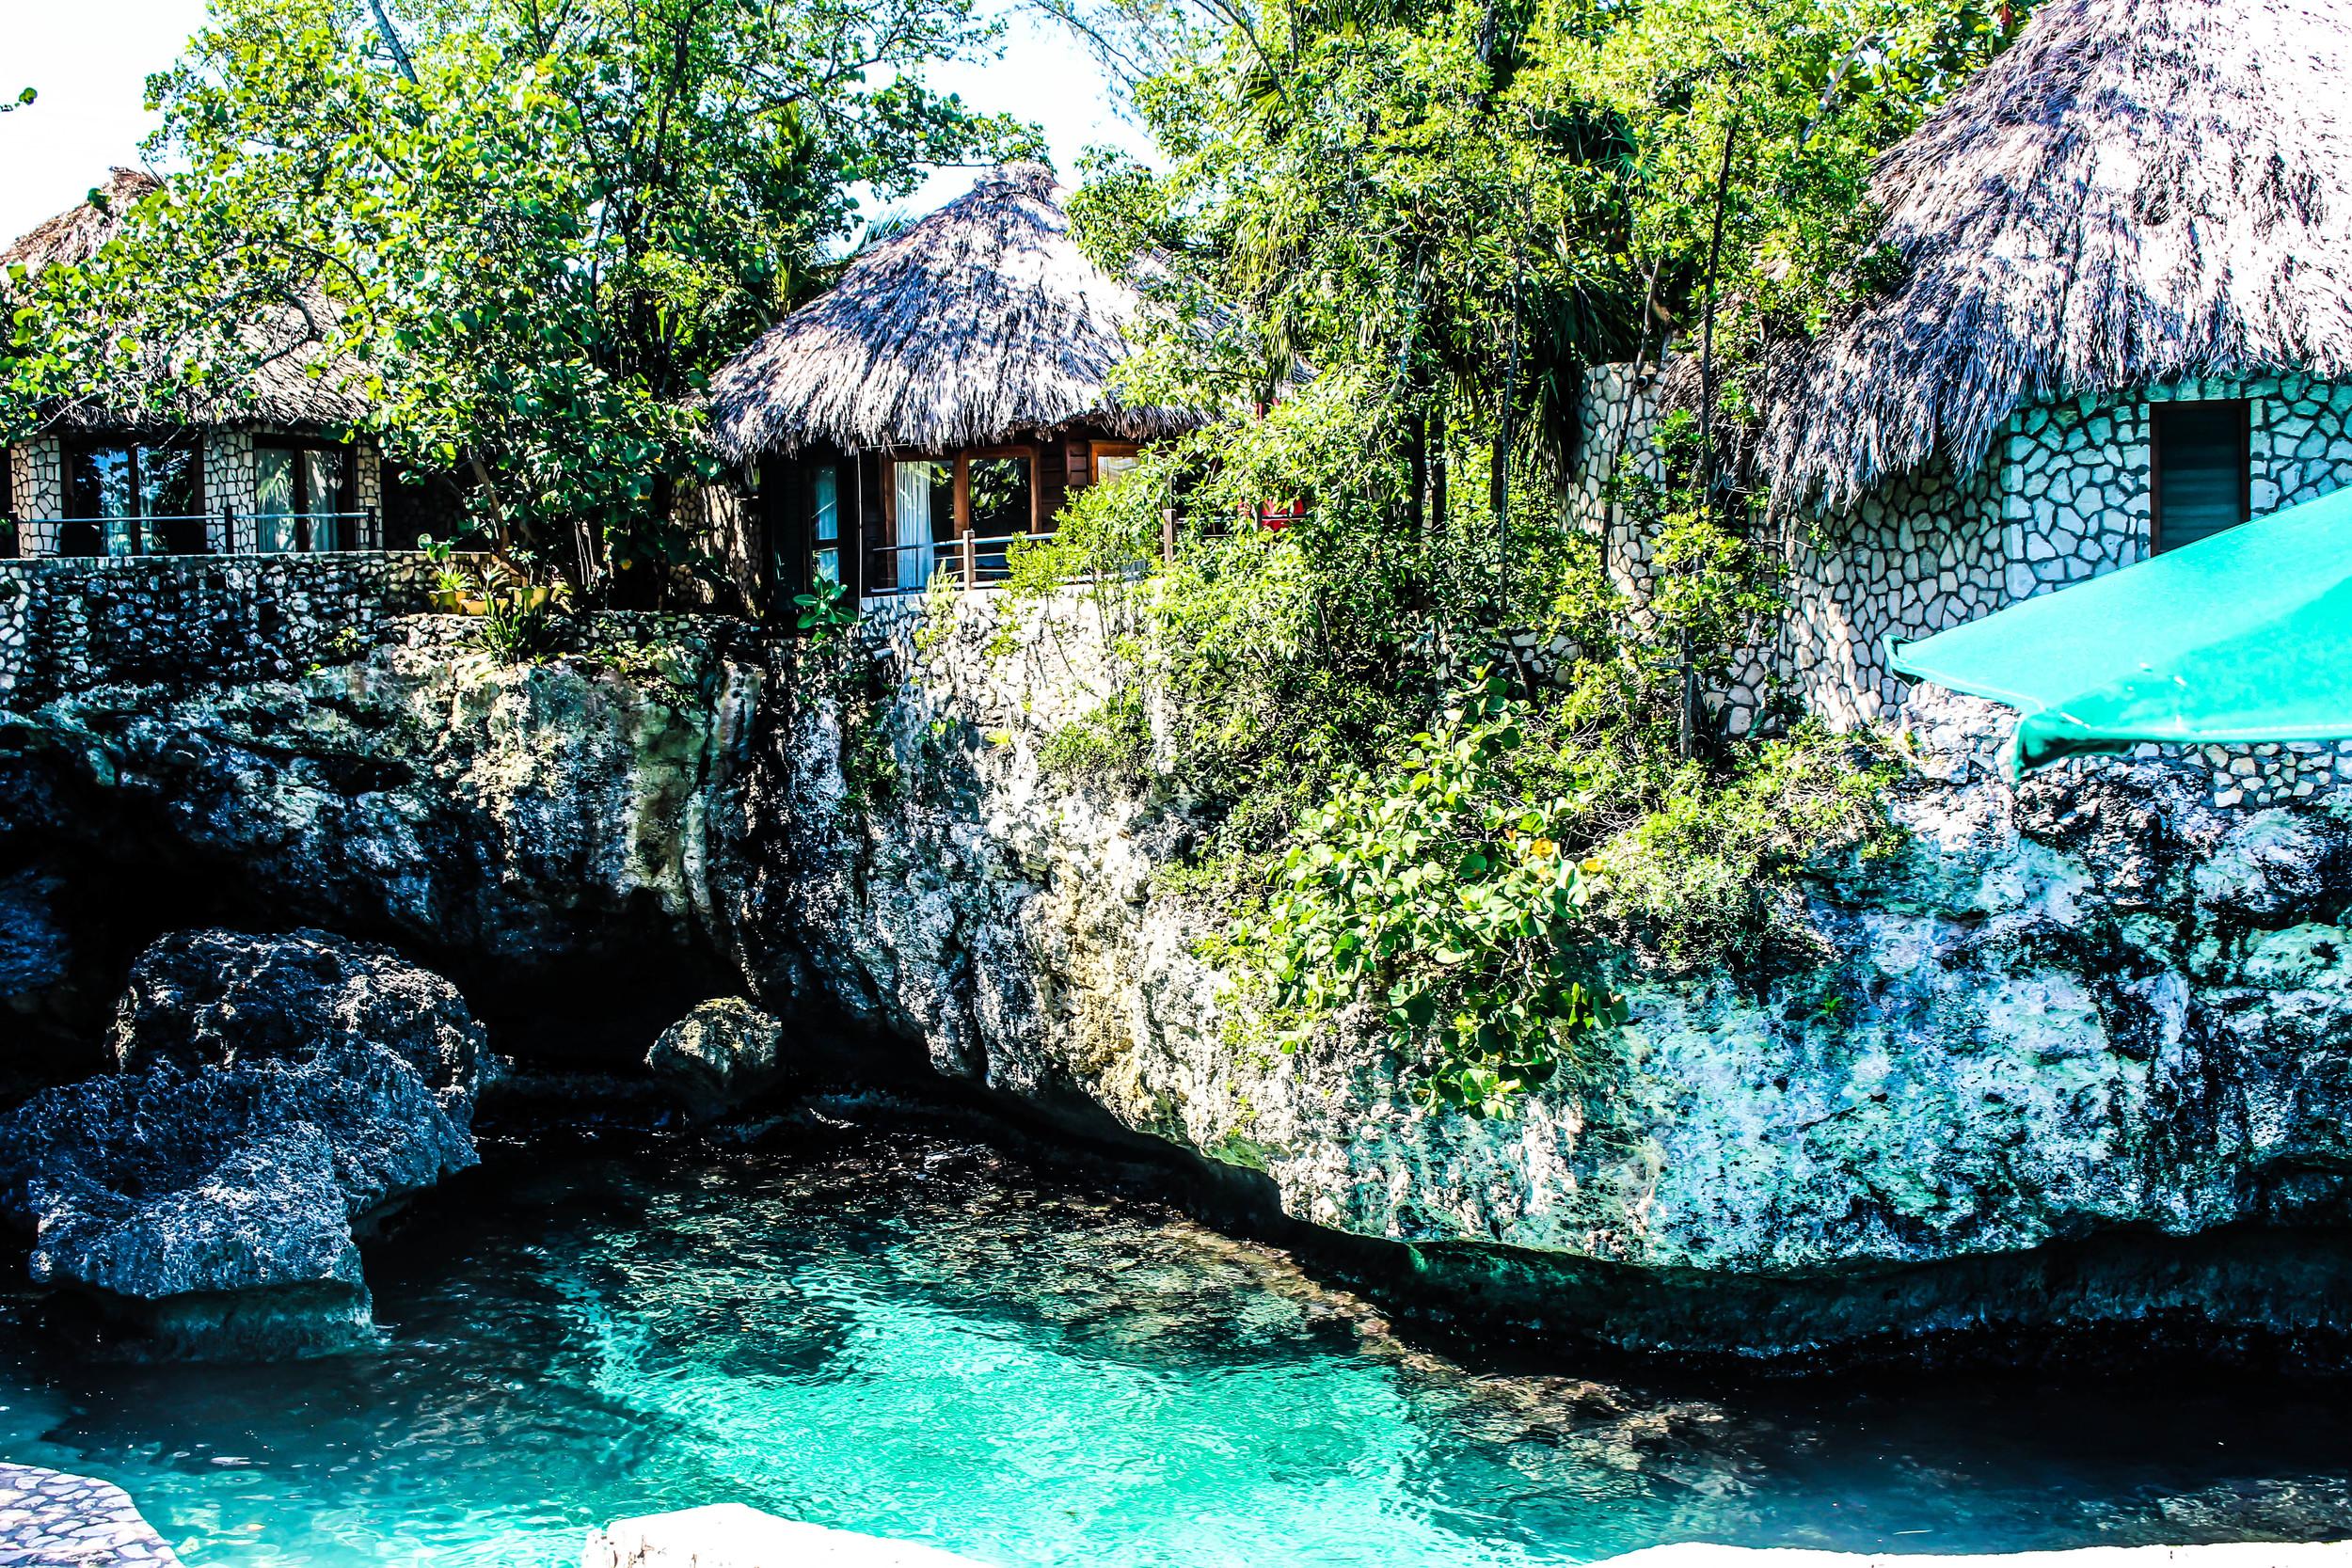 Villas in Rockhouse, Negril, Jamaica. by Nneya Richards